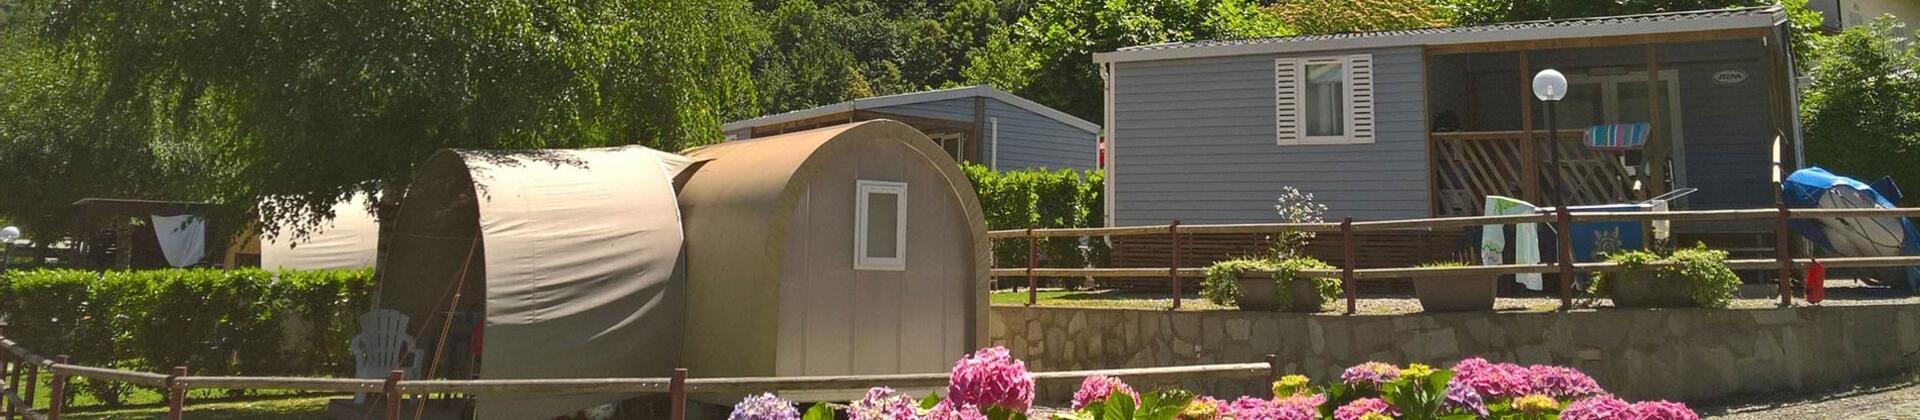 campingdarna nl accommodaties 013